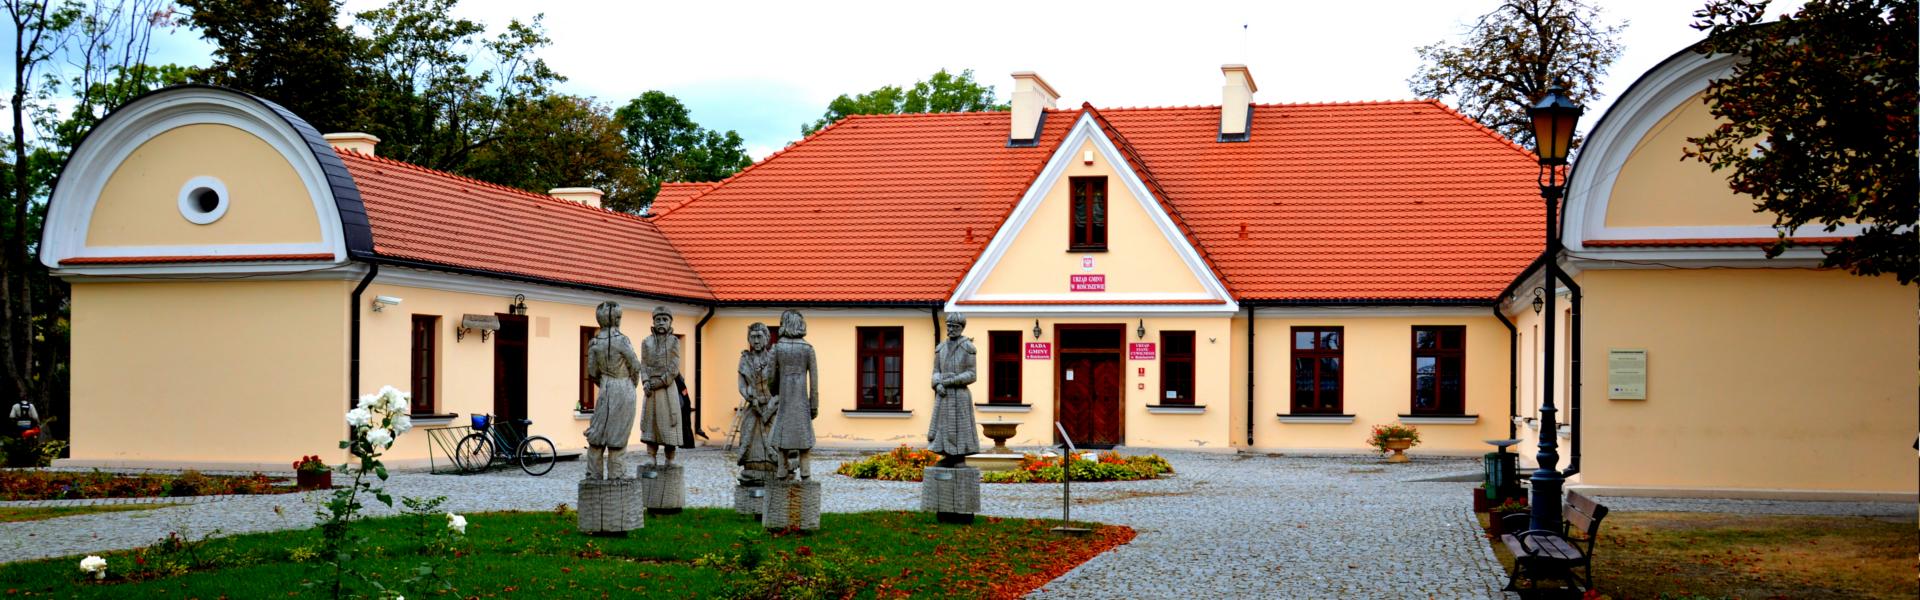 Gmina Rościszewo